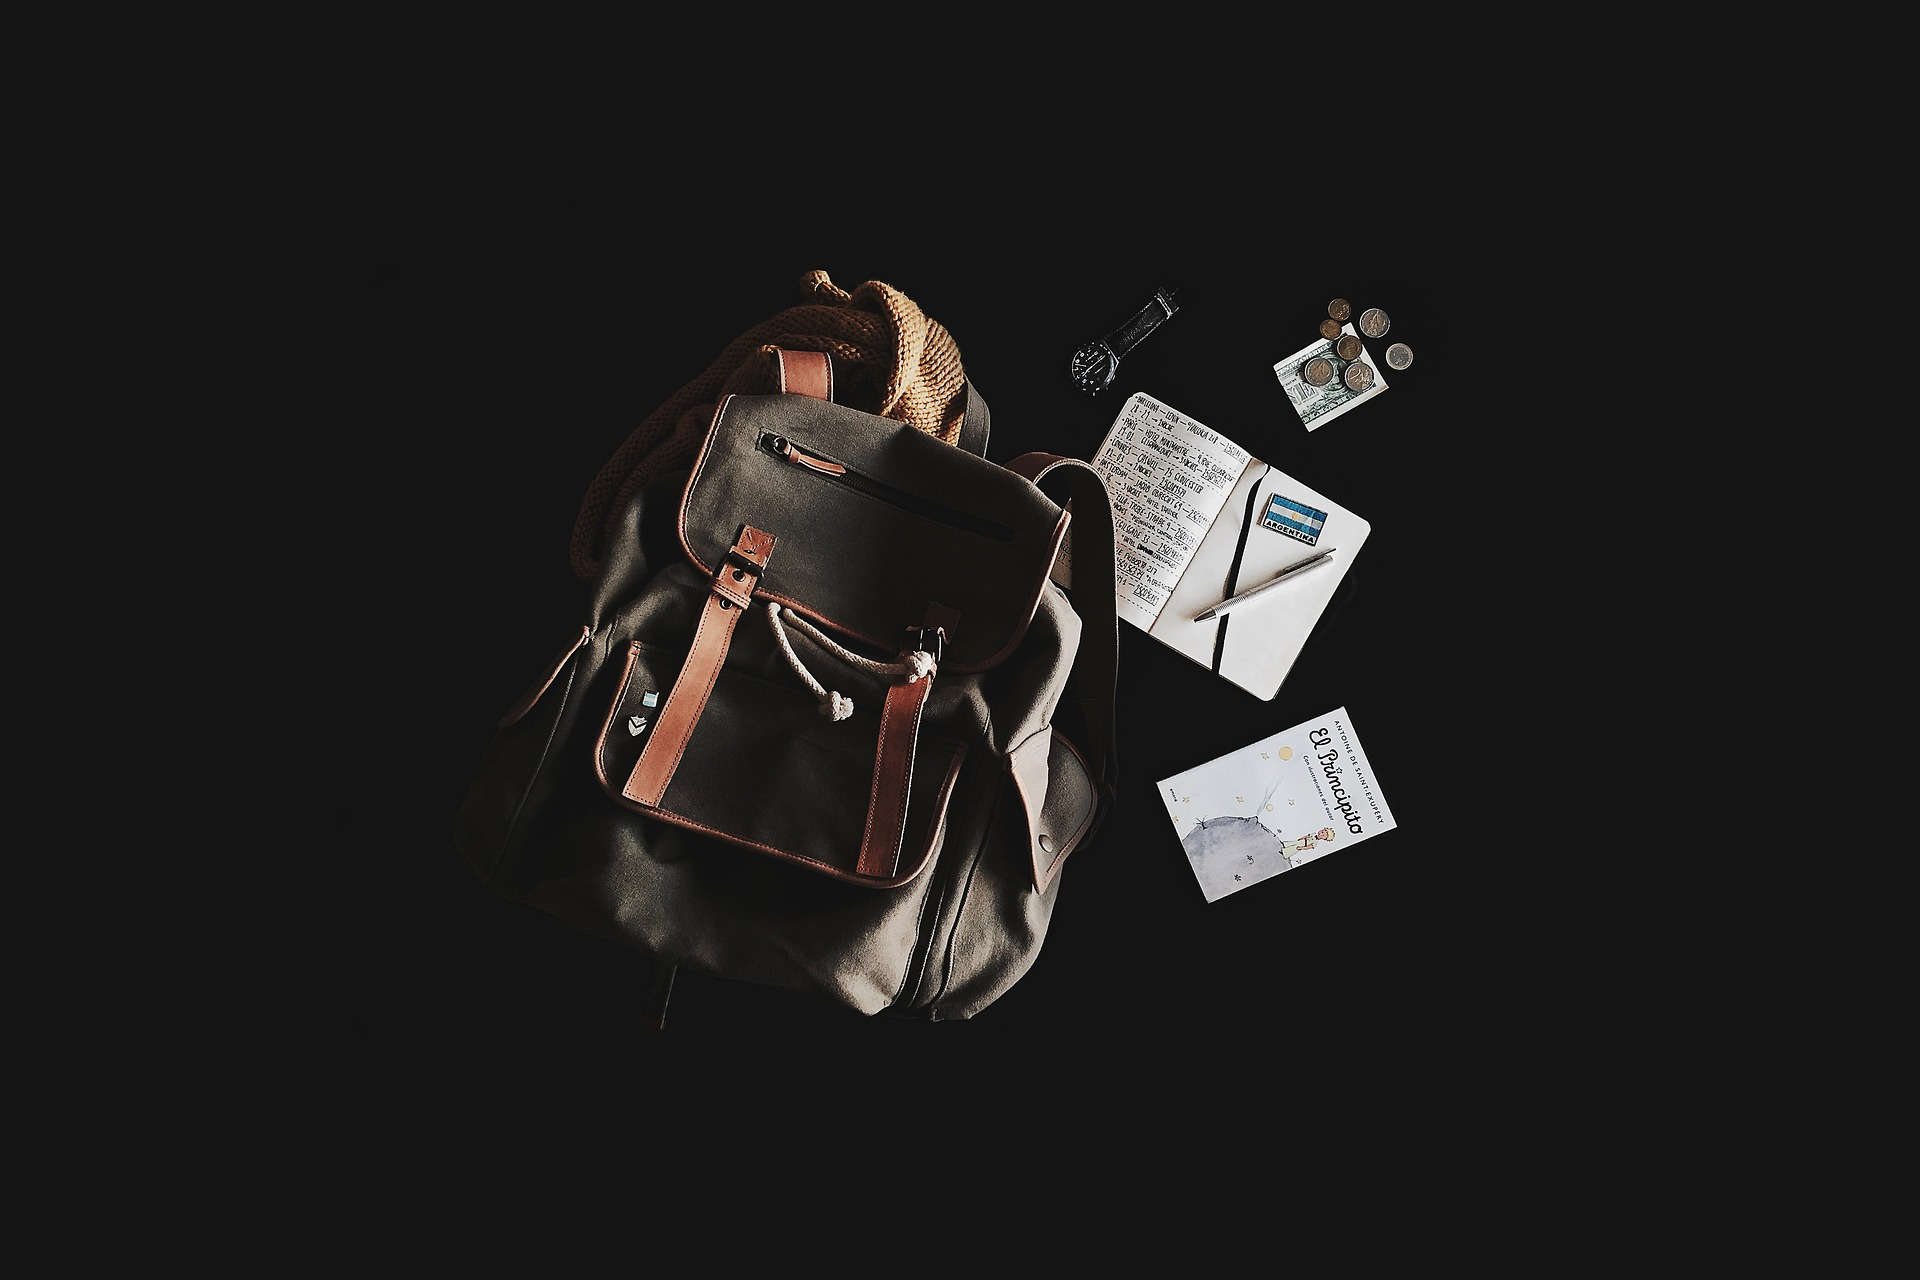 backpack-1839705_1920.jpg